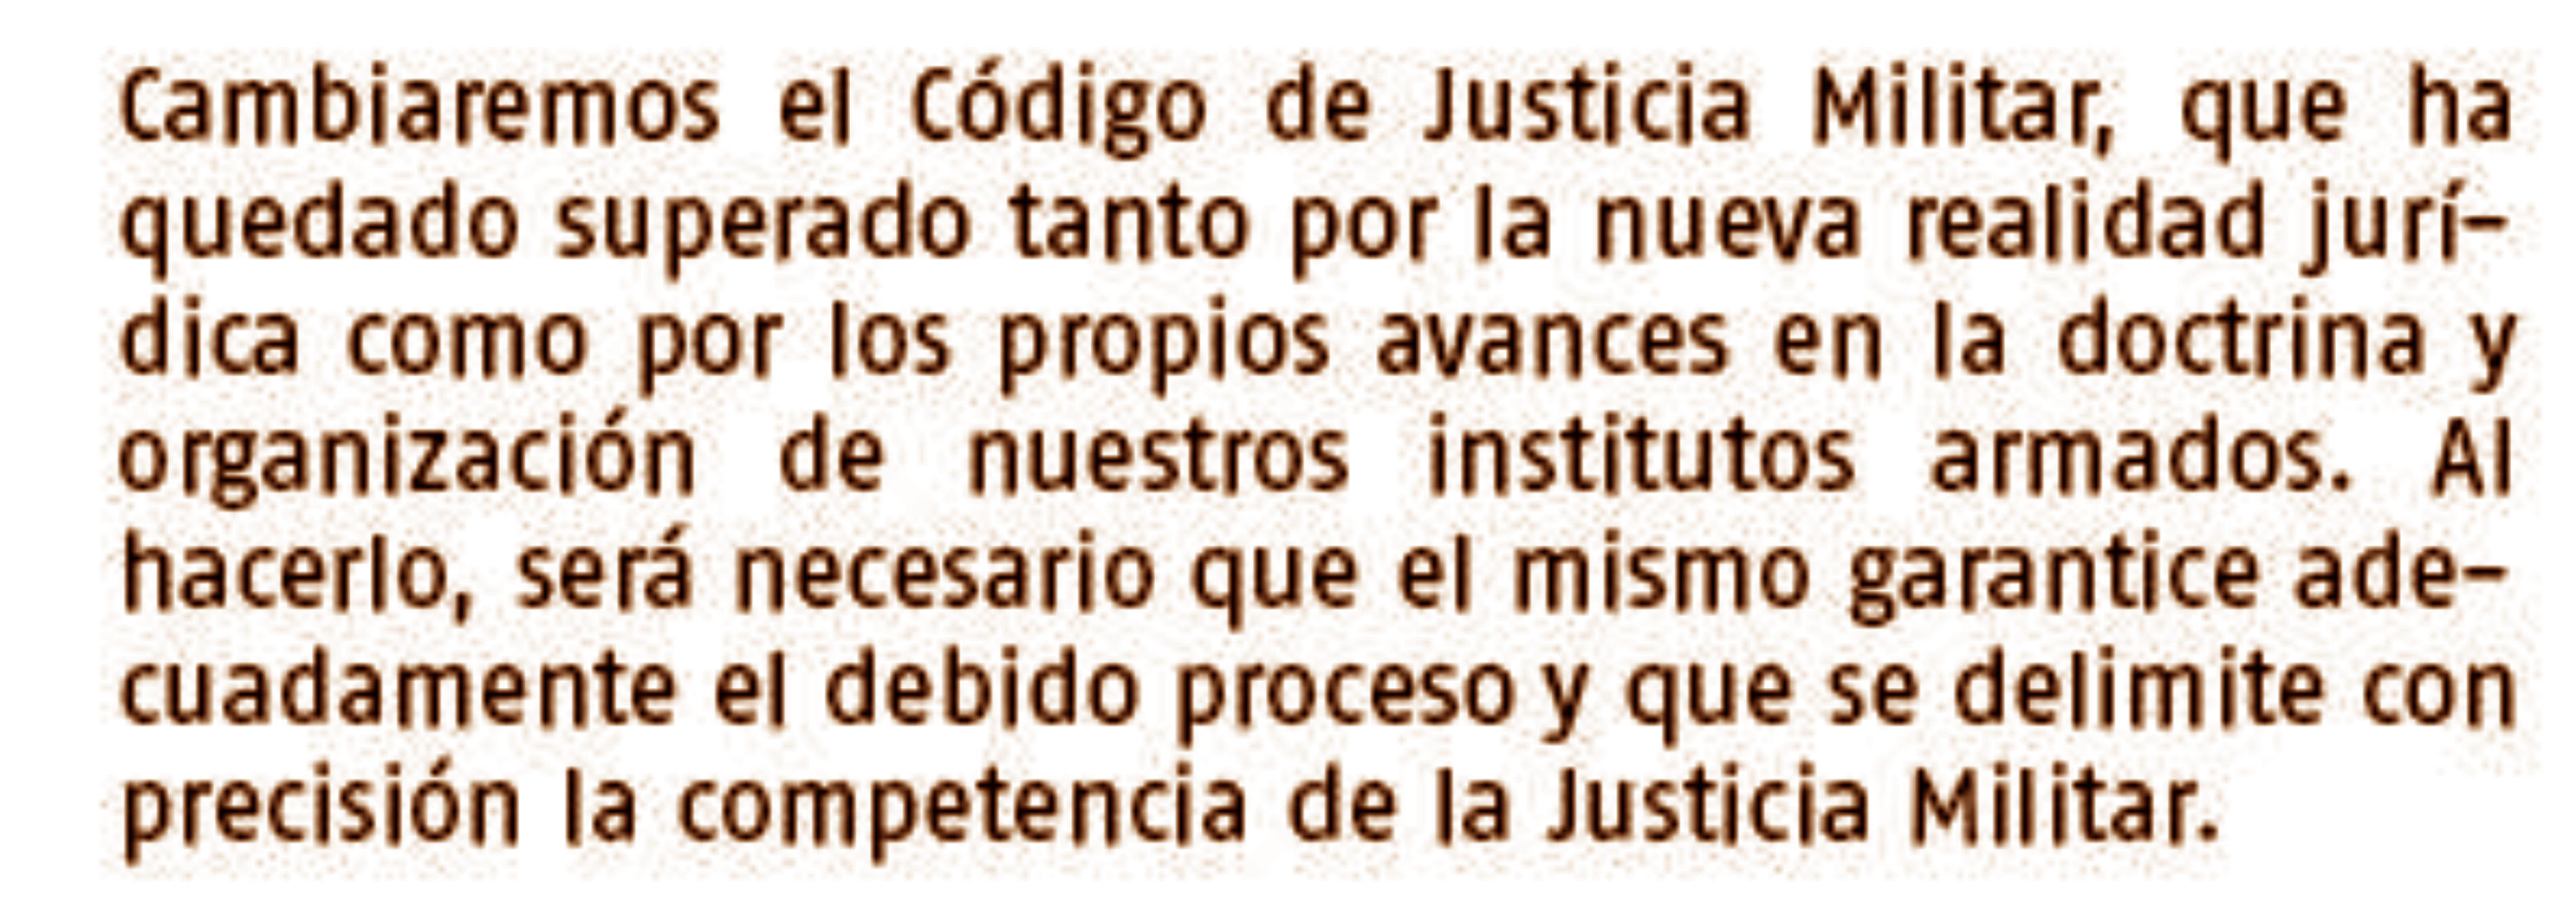 Justicia Militar-Codigo.jpg